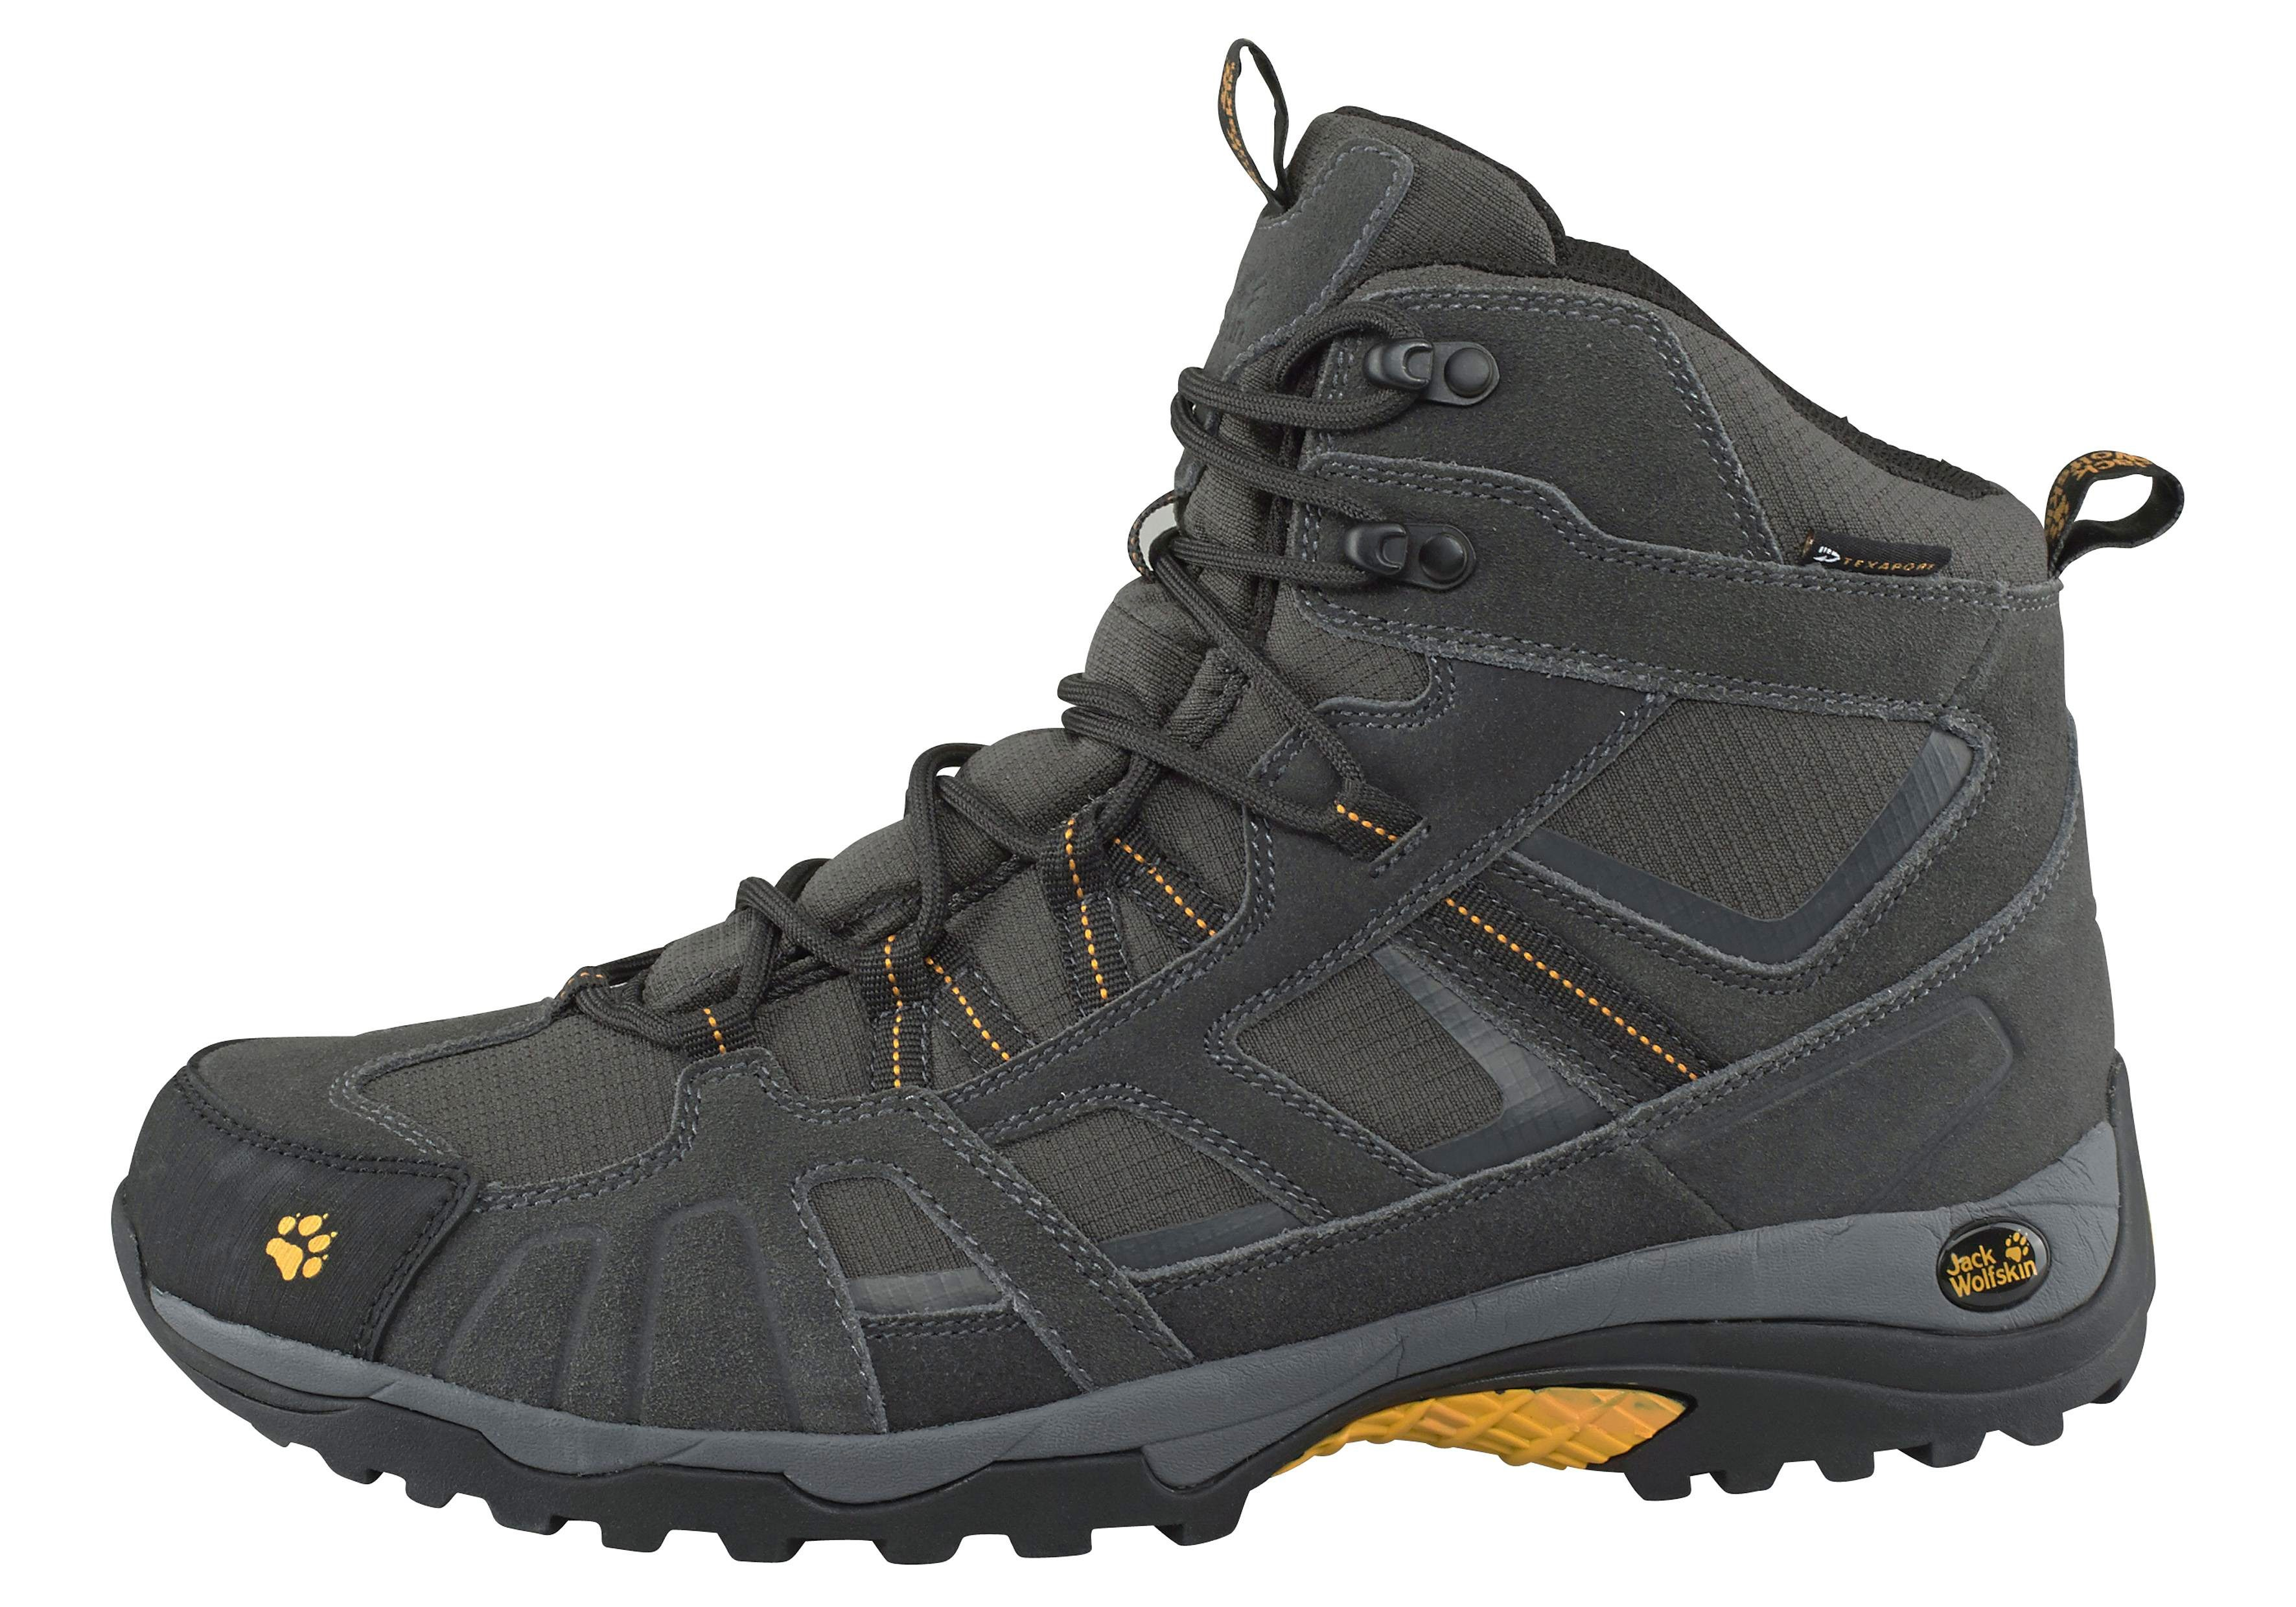 Black Jack Wolfskin Chaussures Texapore Pour Les Hommes ky7sJImC